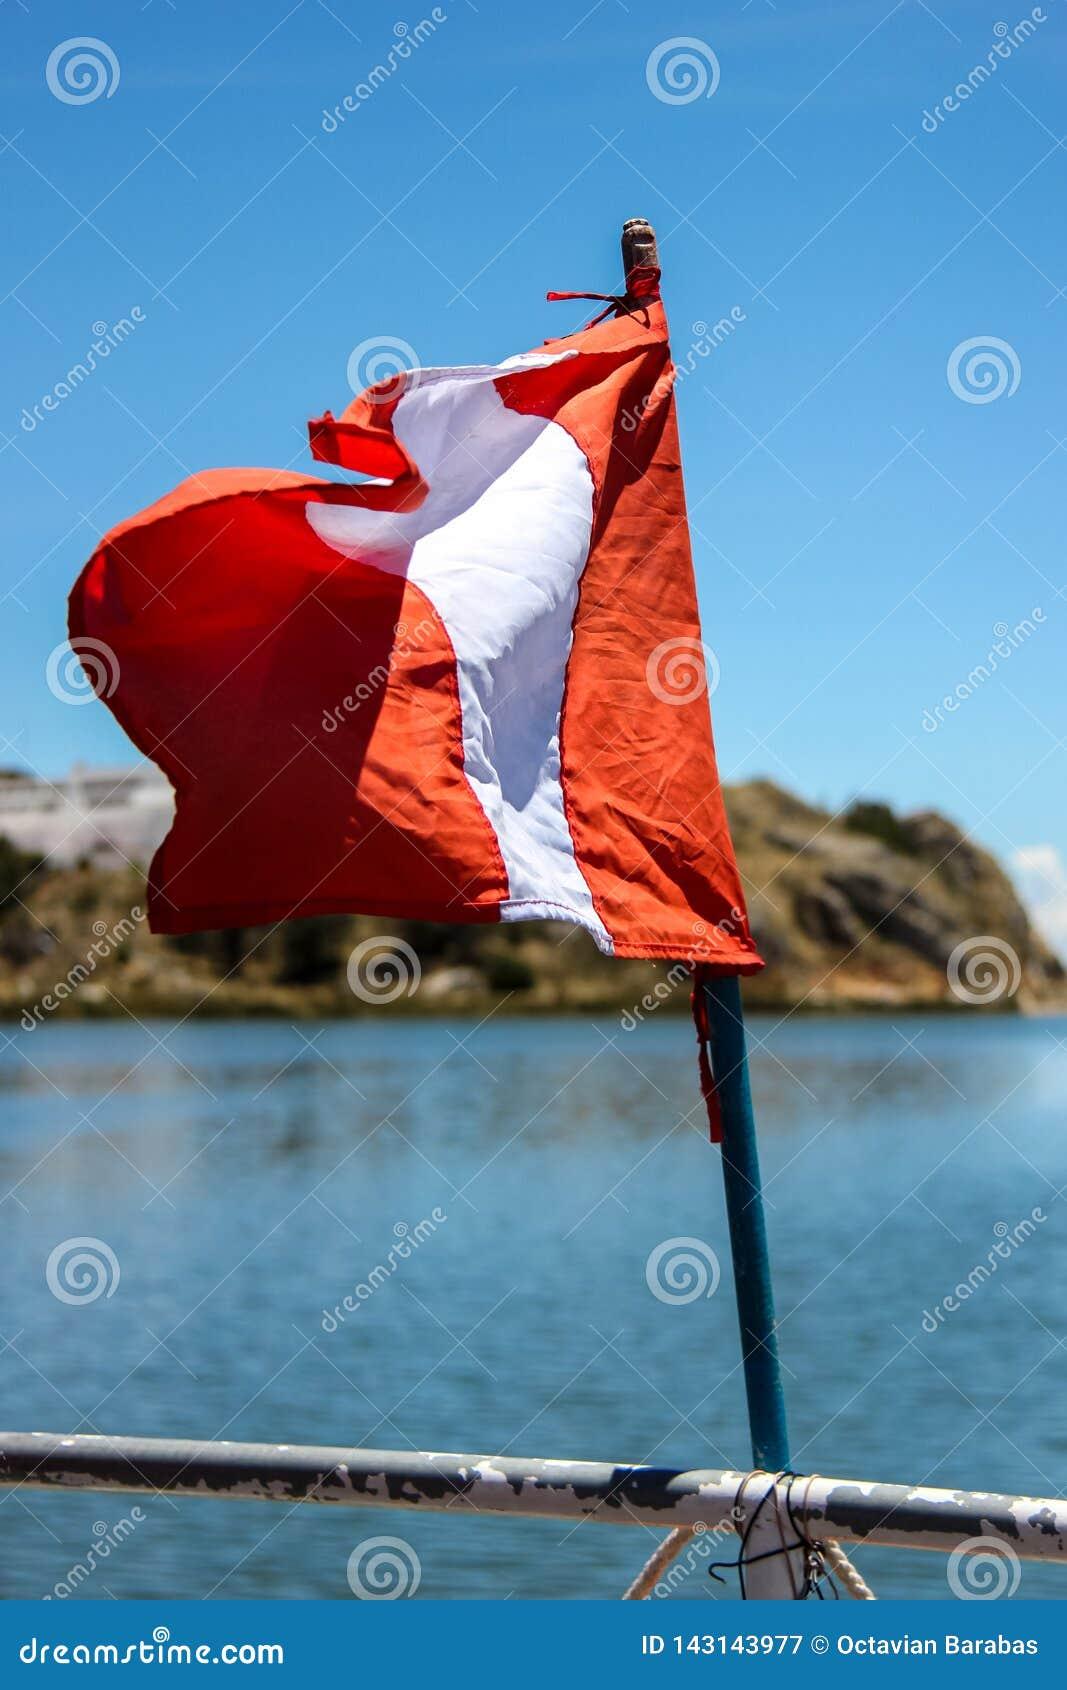 Bandeira do Peru no barco no lago Titicaca